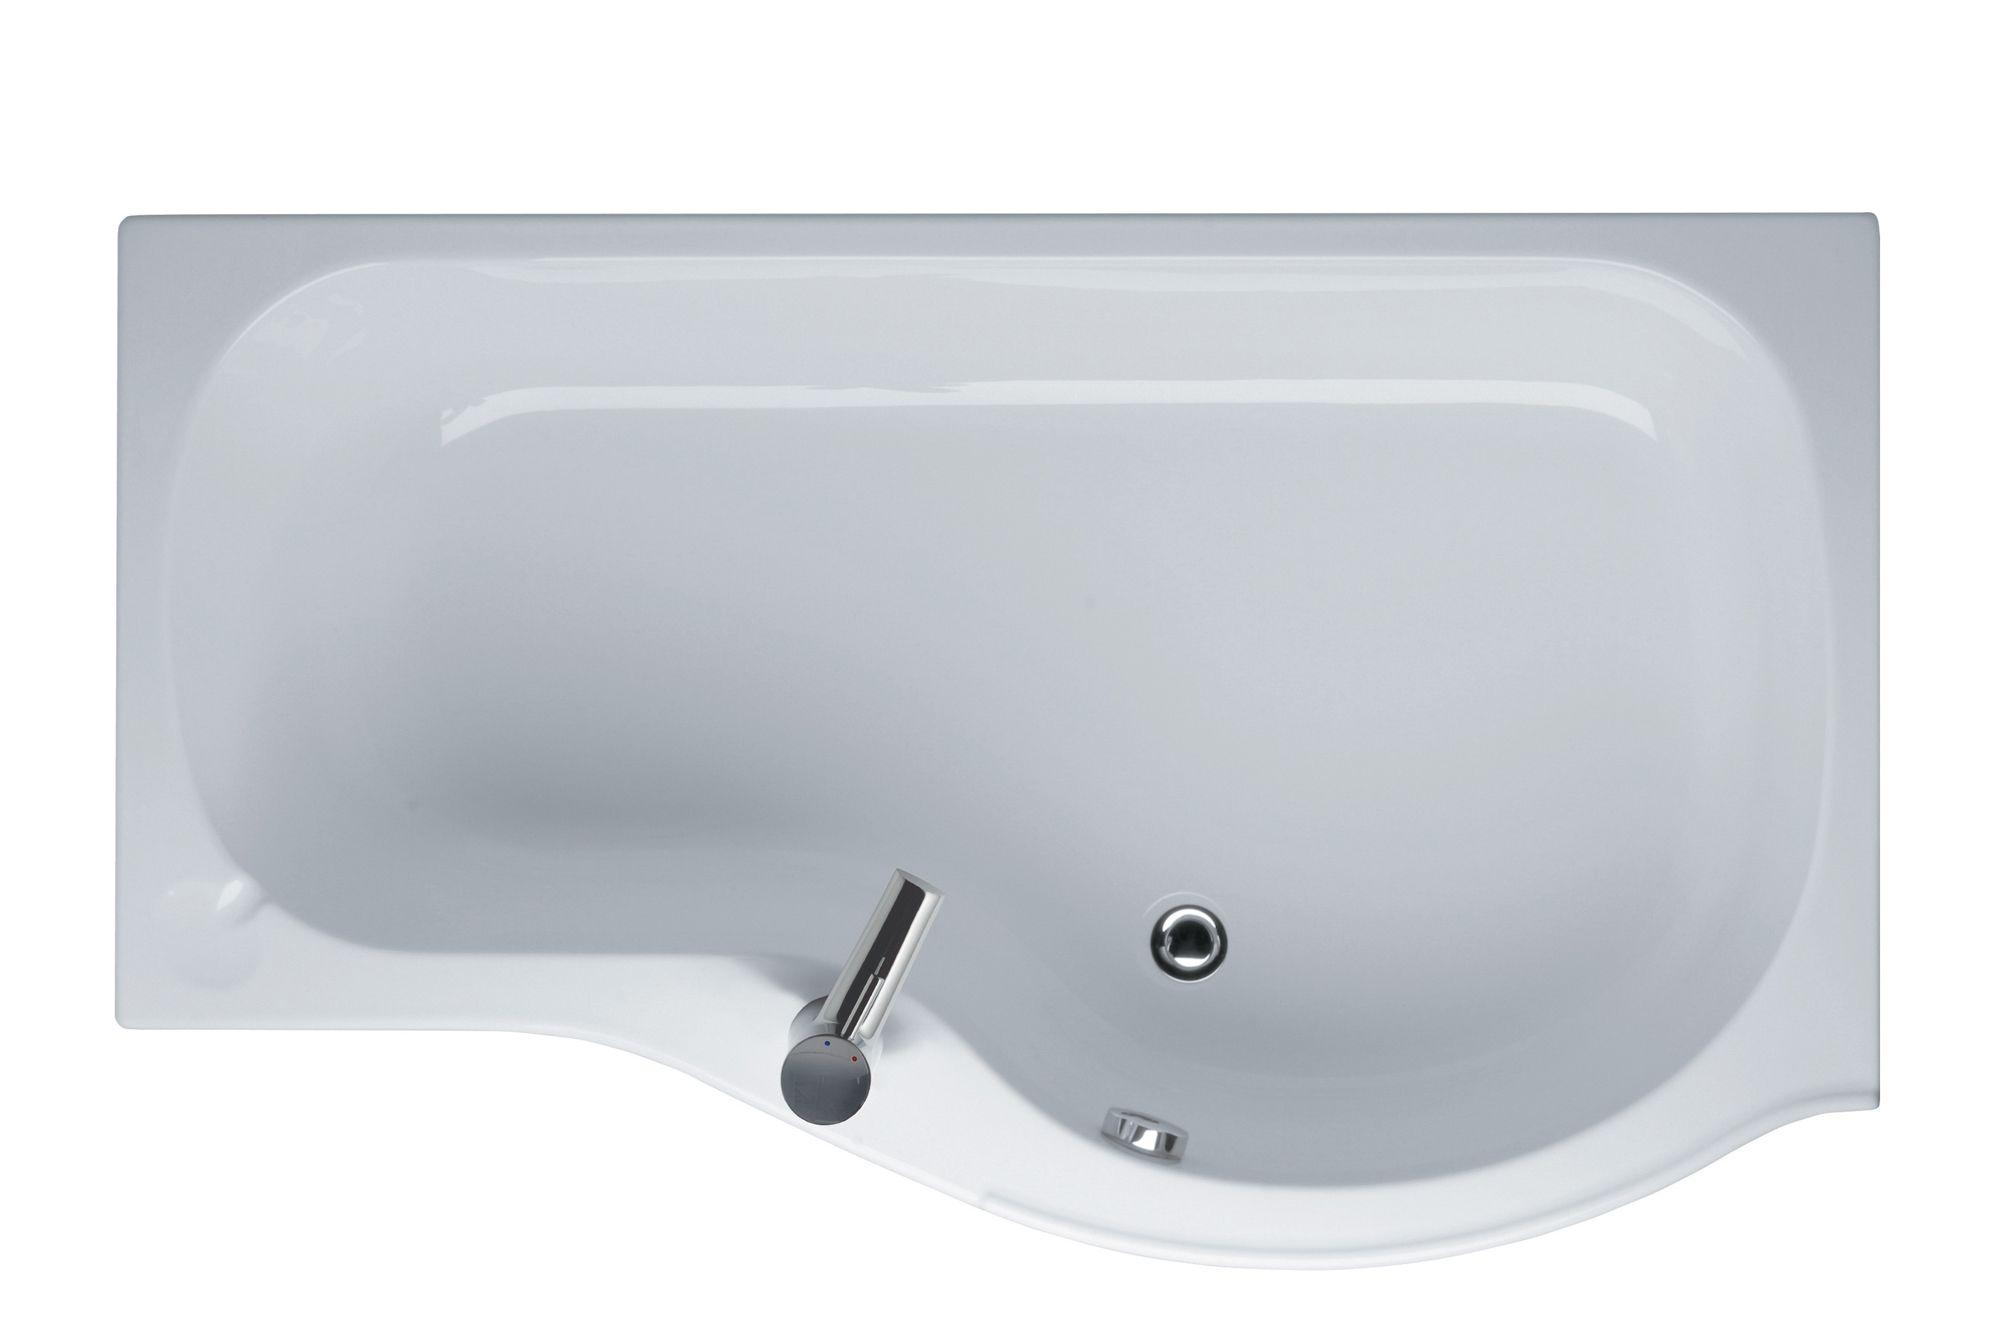 Ideal Standard Space Rh Acrylic P Shaped Shower Bath L